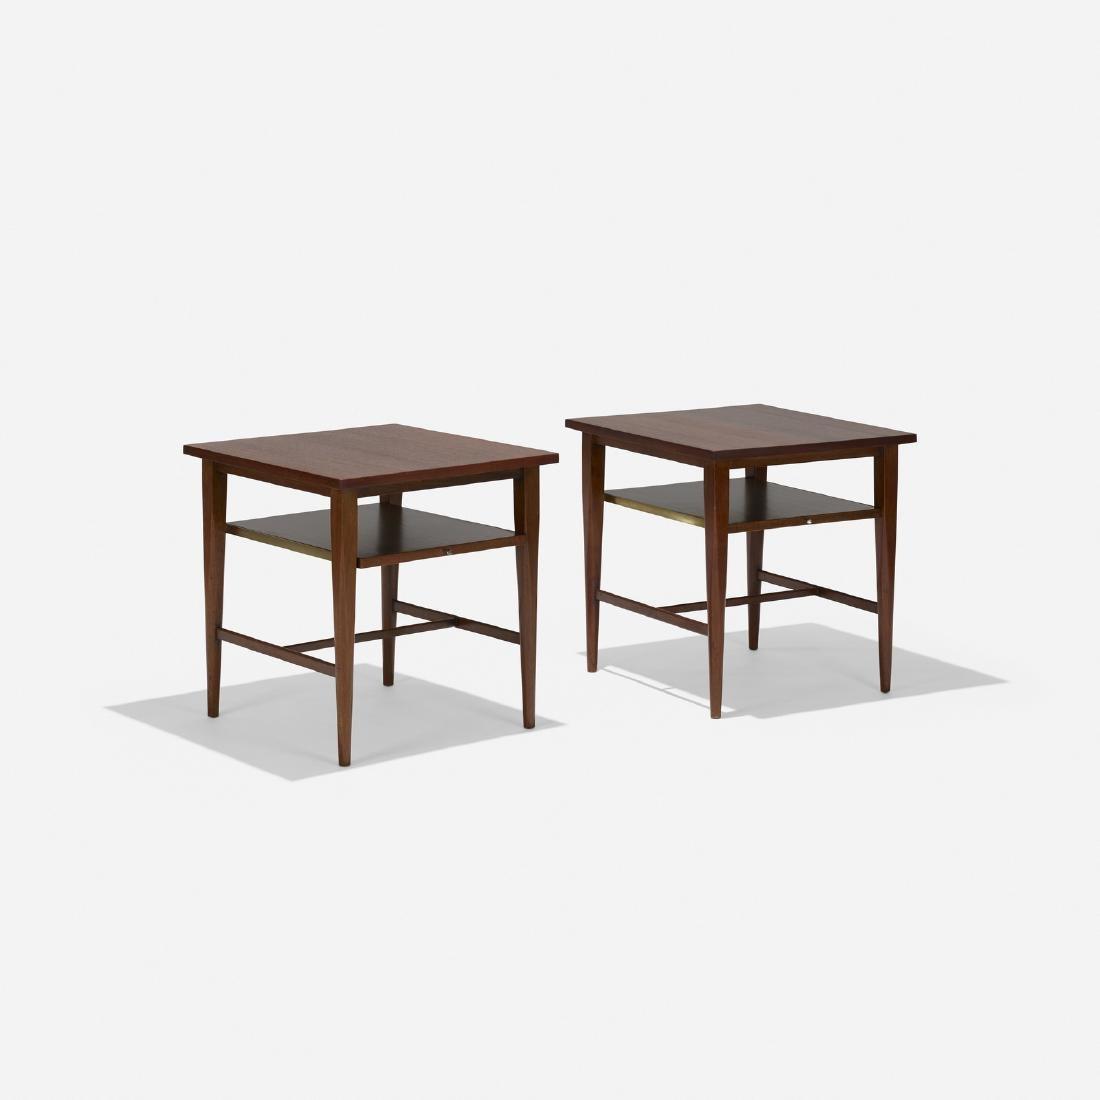 Paul McCobb, Directional nightstands model 1047, pair